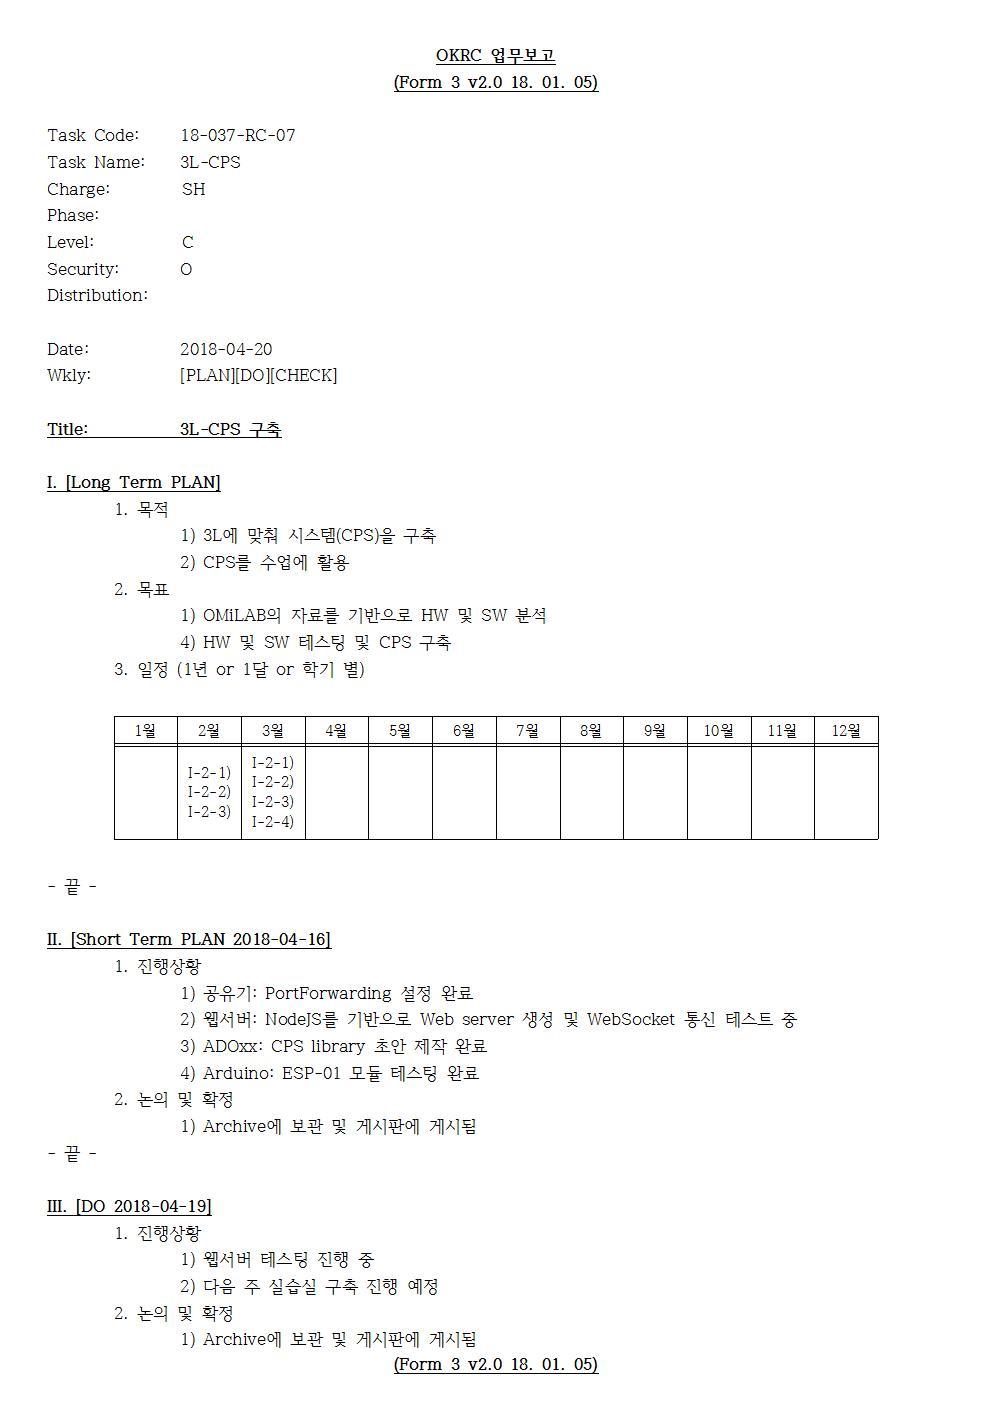 D-[18-037-RC-07]-[3L-CPS]-[2018-04-20][SH]001.jpg